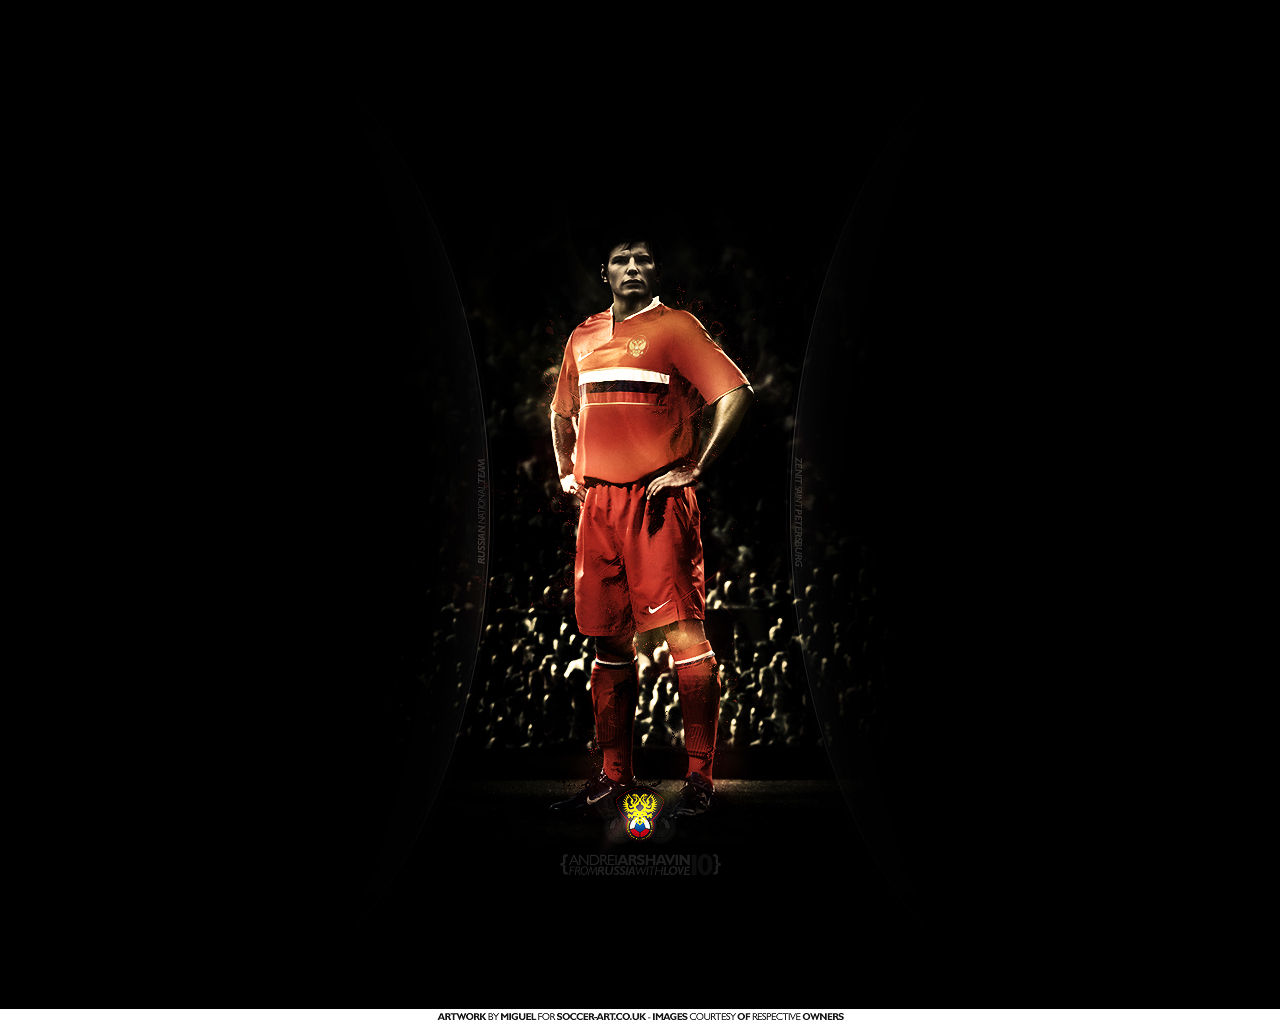 Football Wallpaper At Rs 100 Square Feet: Football (Soccer) Wallpapers Desing